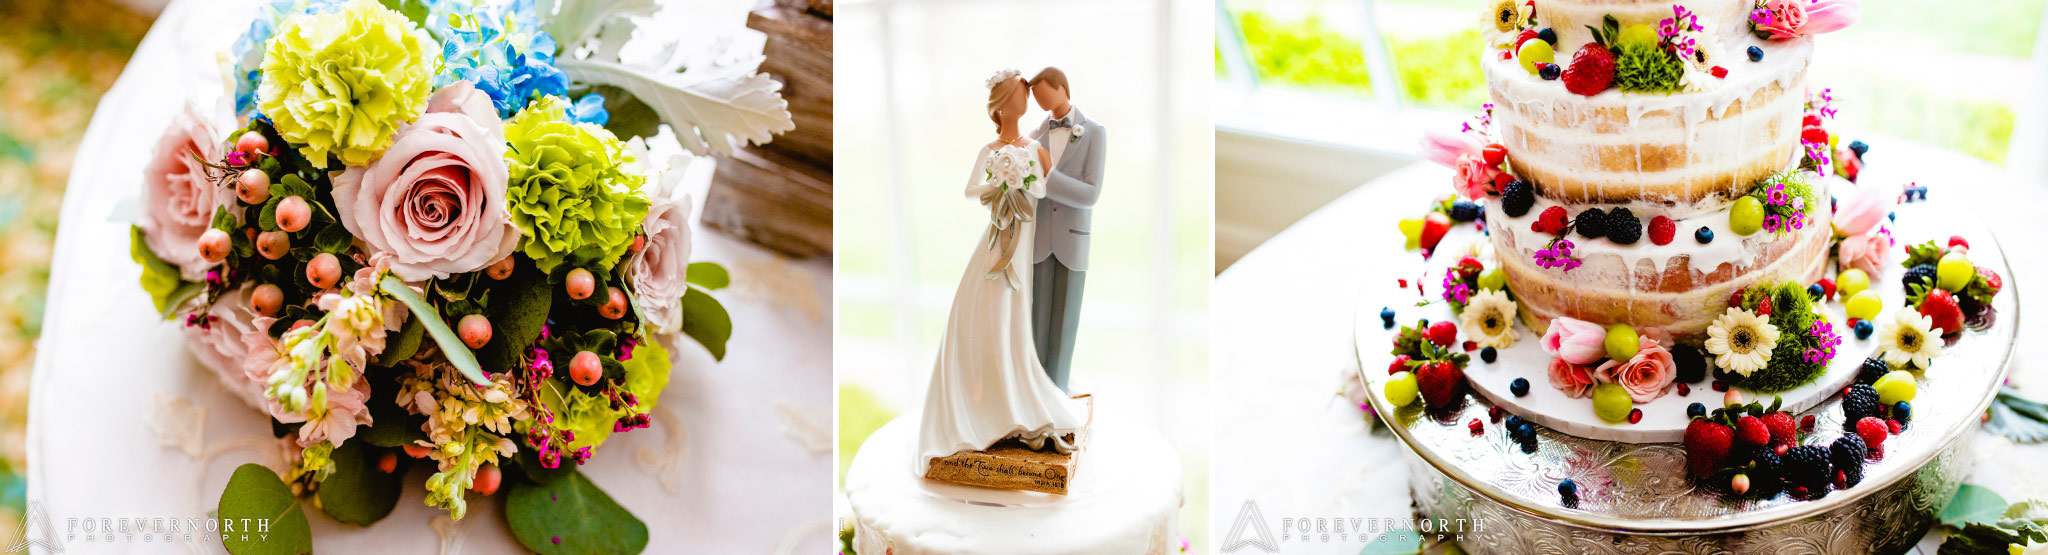 Rivera-Bradford-Estate-Wedding-Photographer-02.JPG